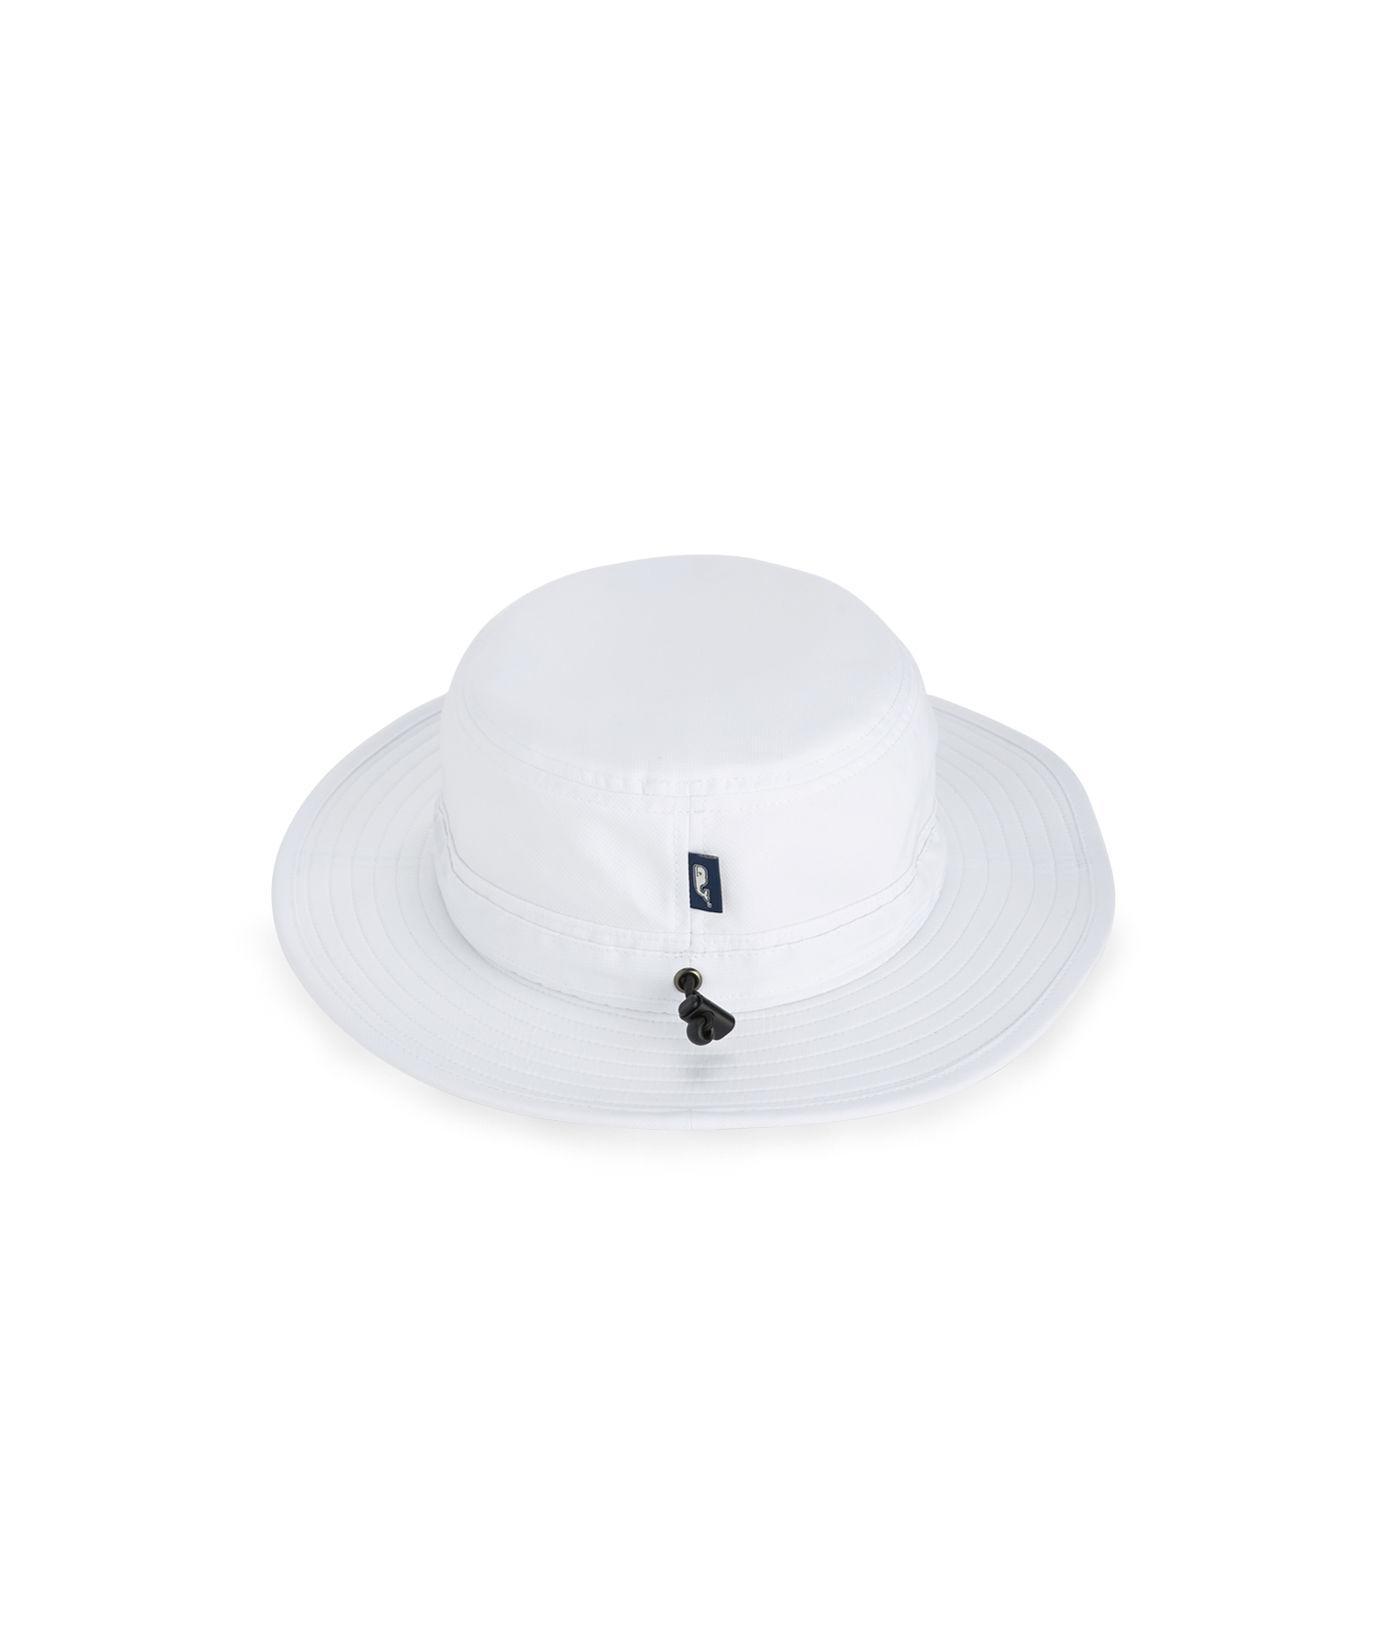 Lyst - Vineyard Vines Whale Dot Performance Bucket Hat in White for Men 430068e736a